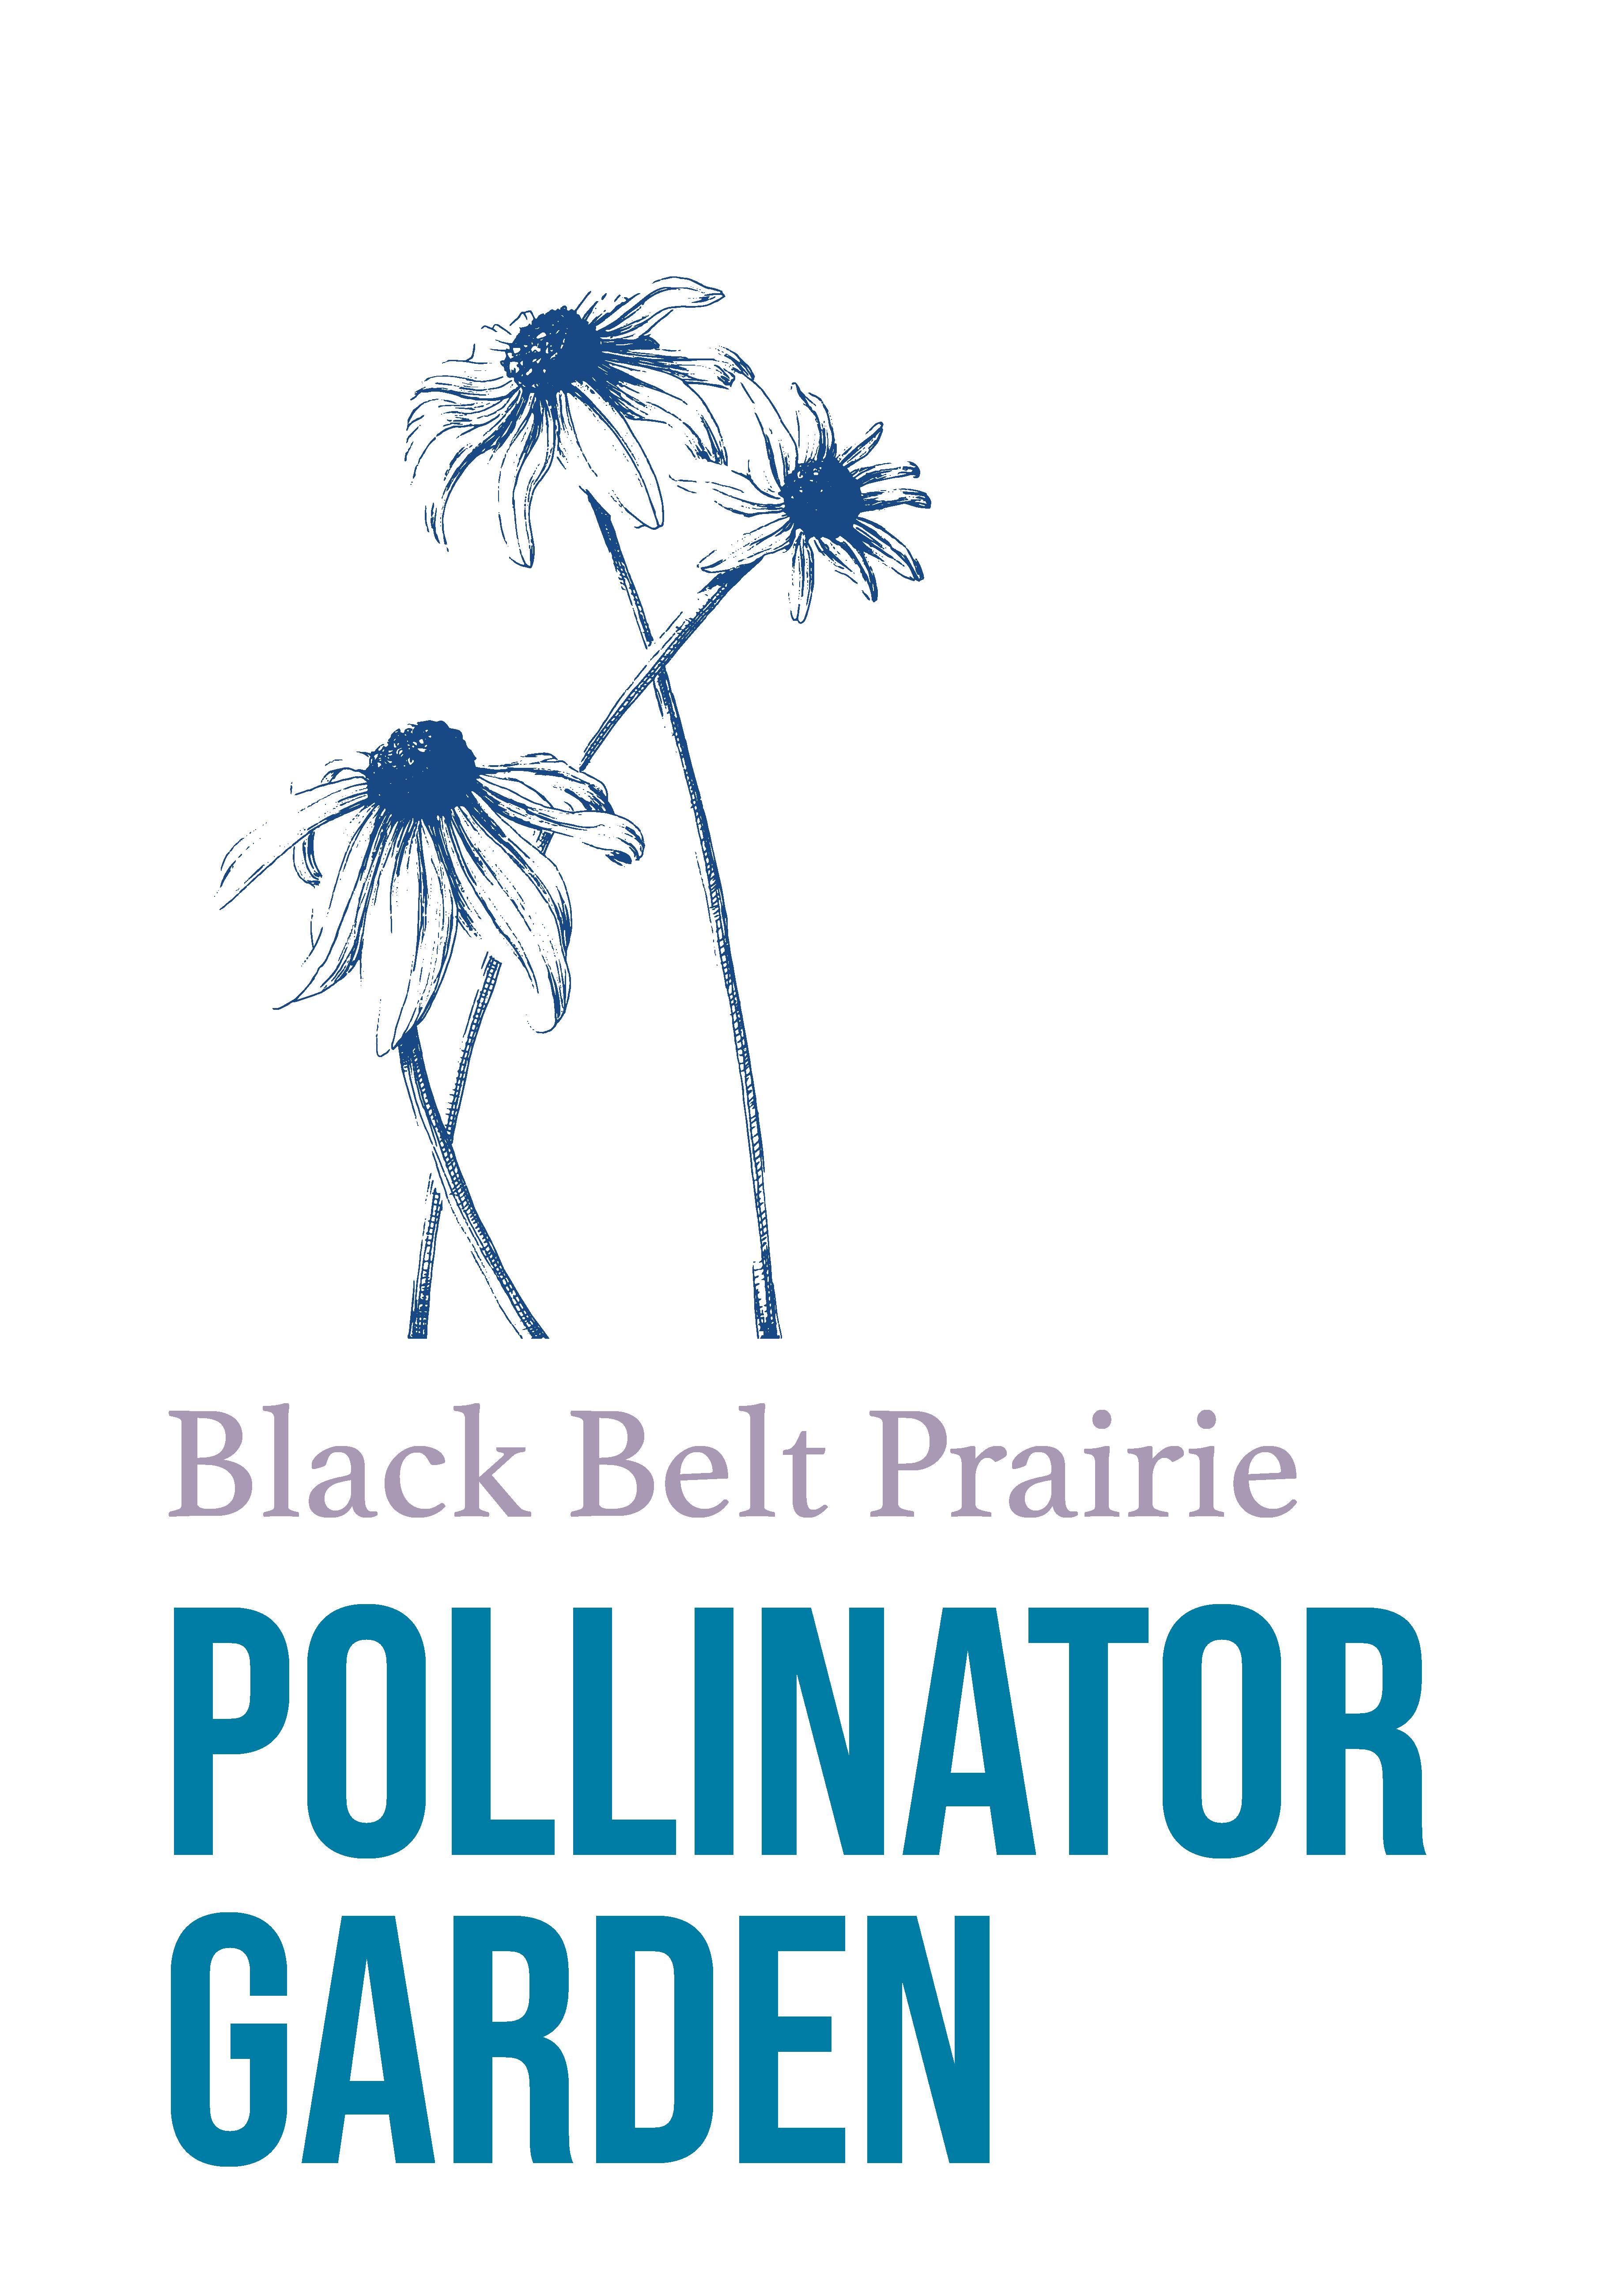 Pollinator Garden Black Belt Blackbelt Prairie Feed a bee Bayer #FeedABee #feedabee